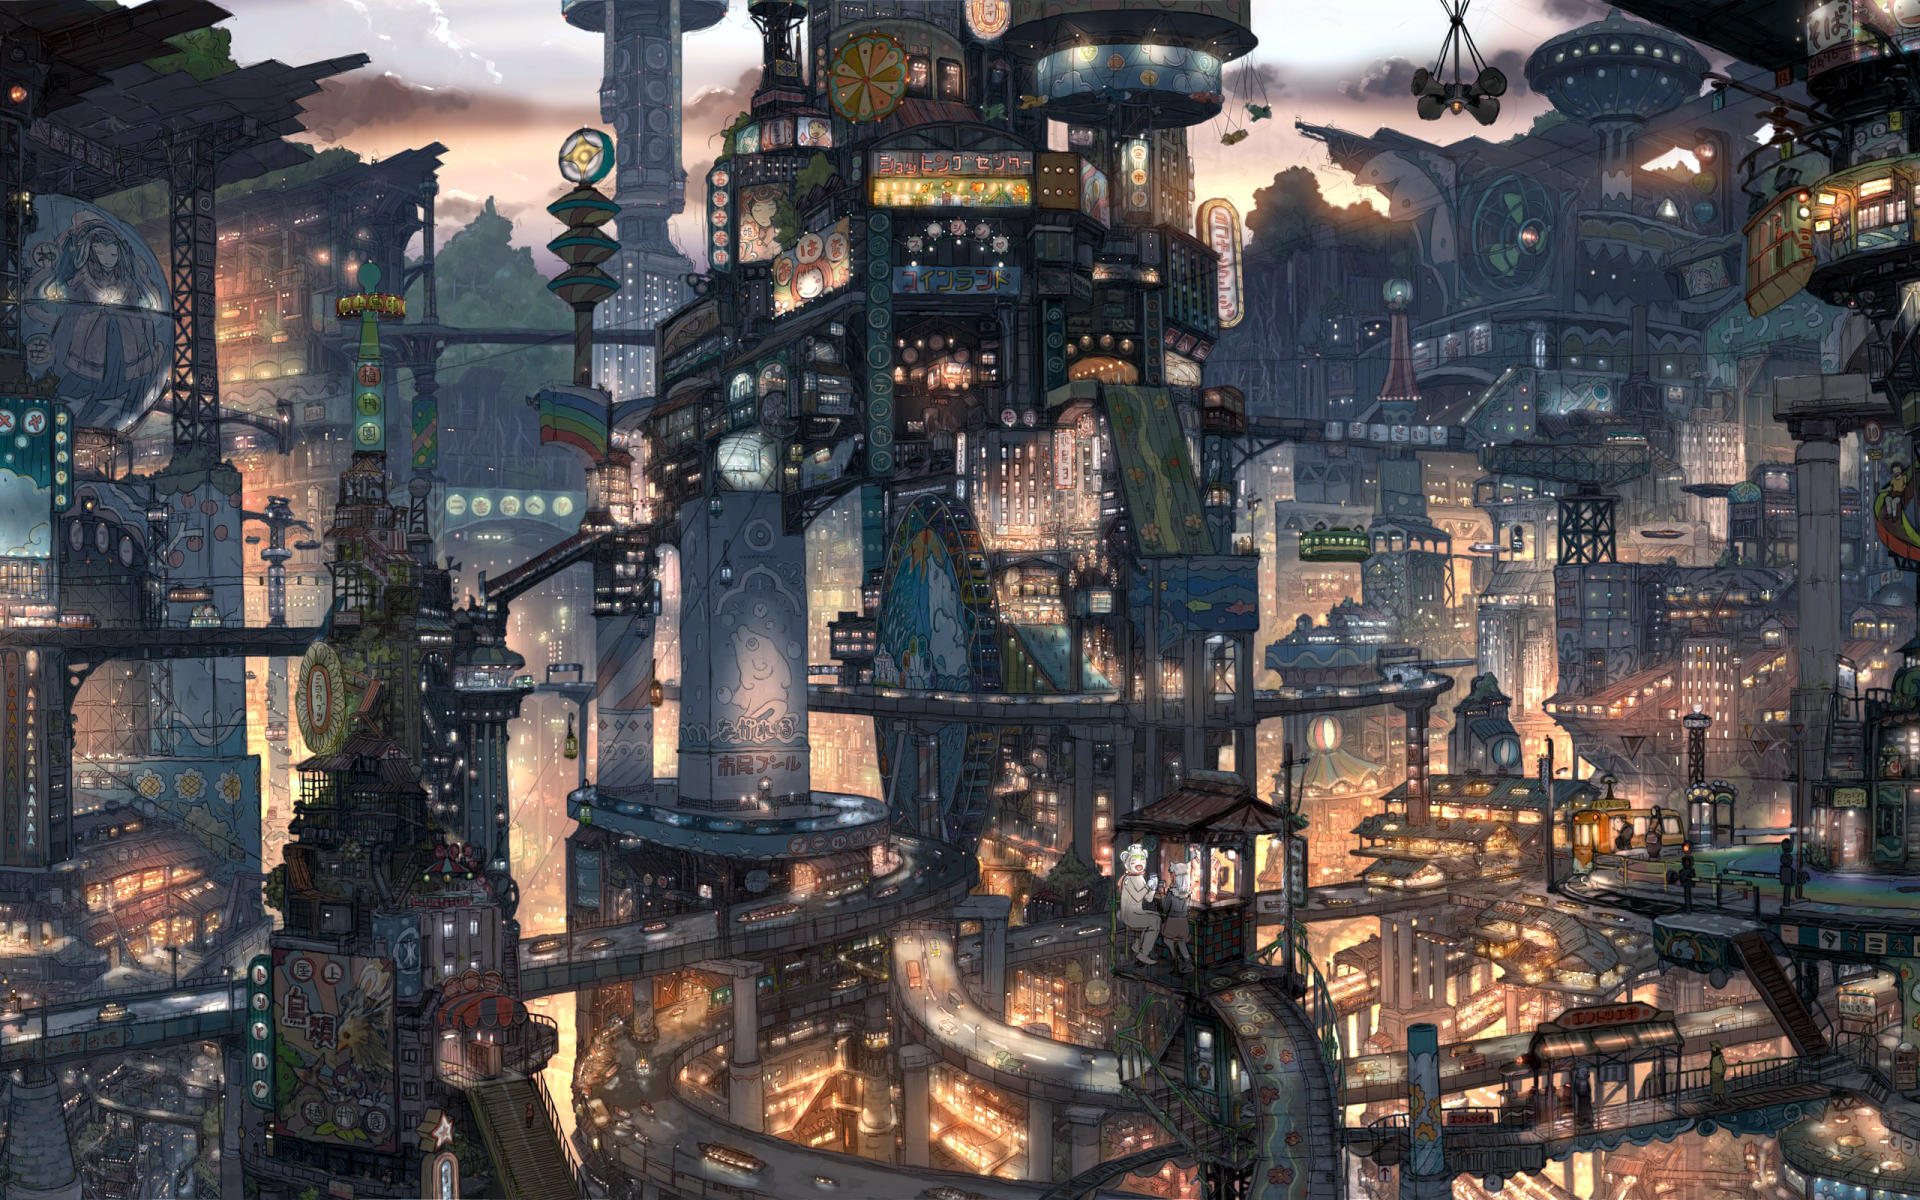 anime city win7 theme by saturdaysx on deviantart